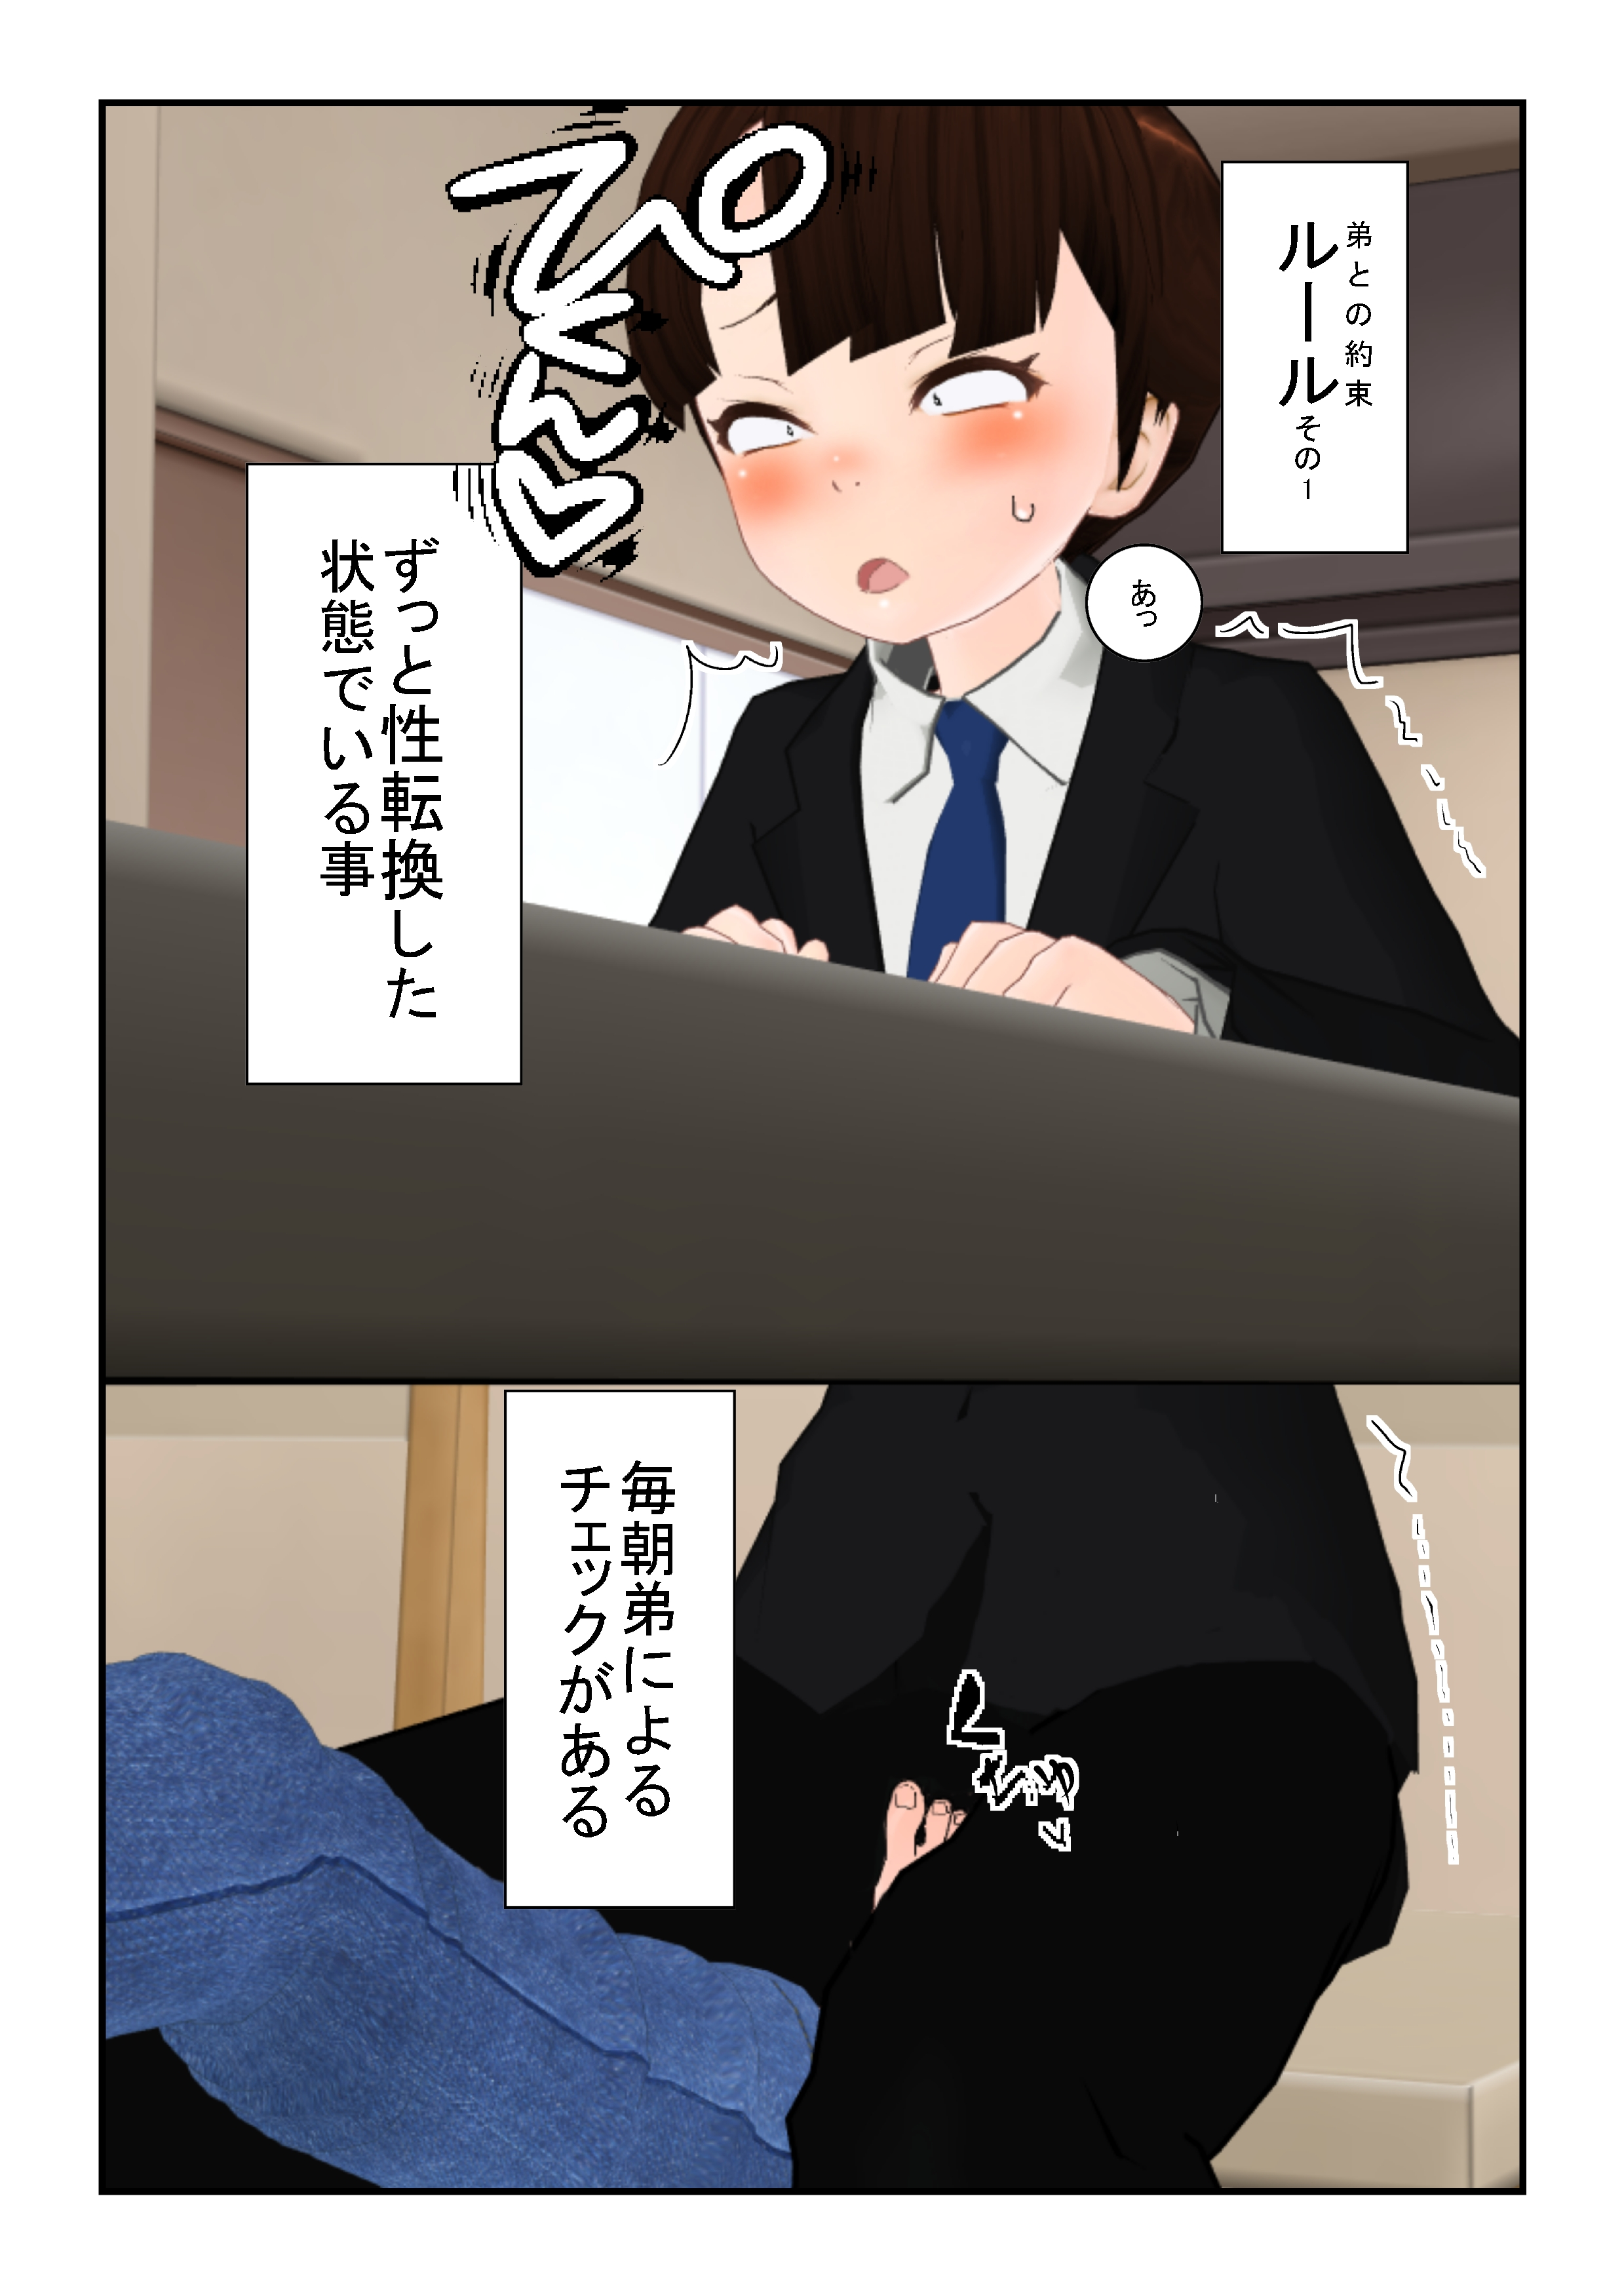 himitsu_0007.jpg